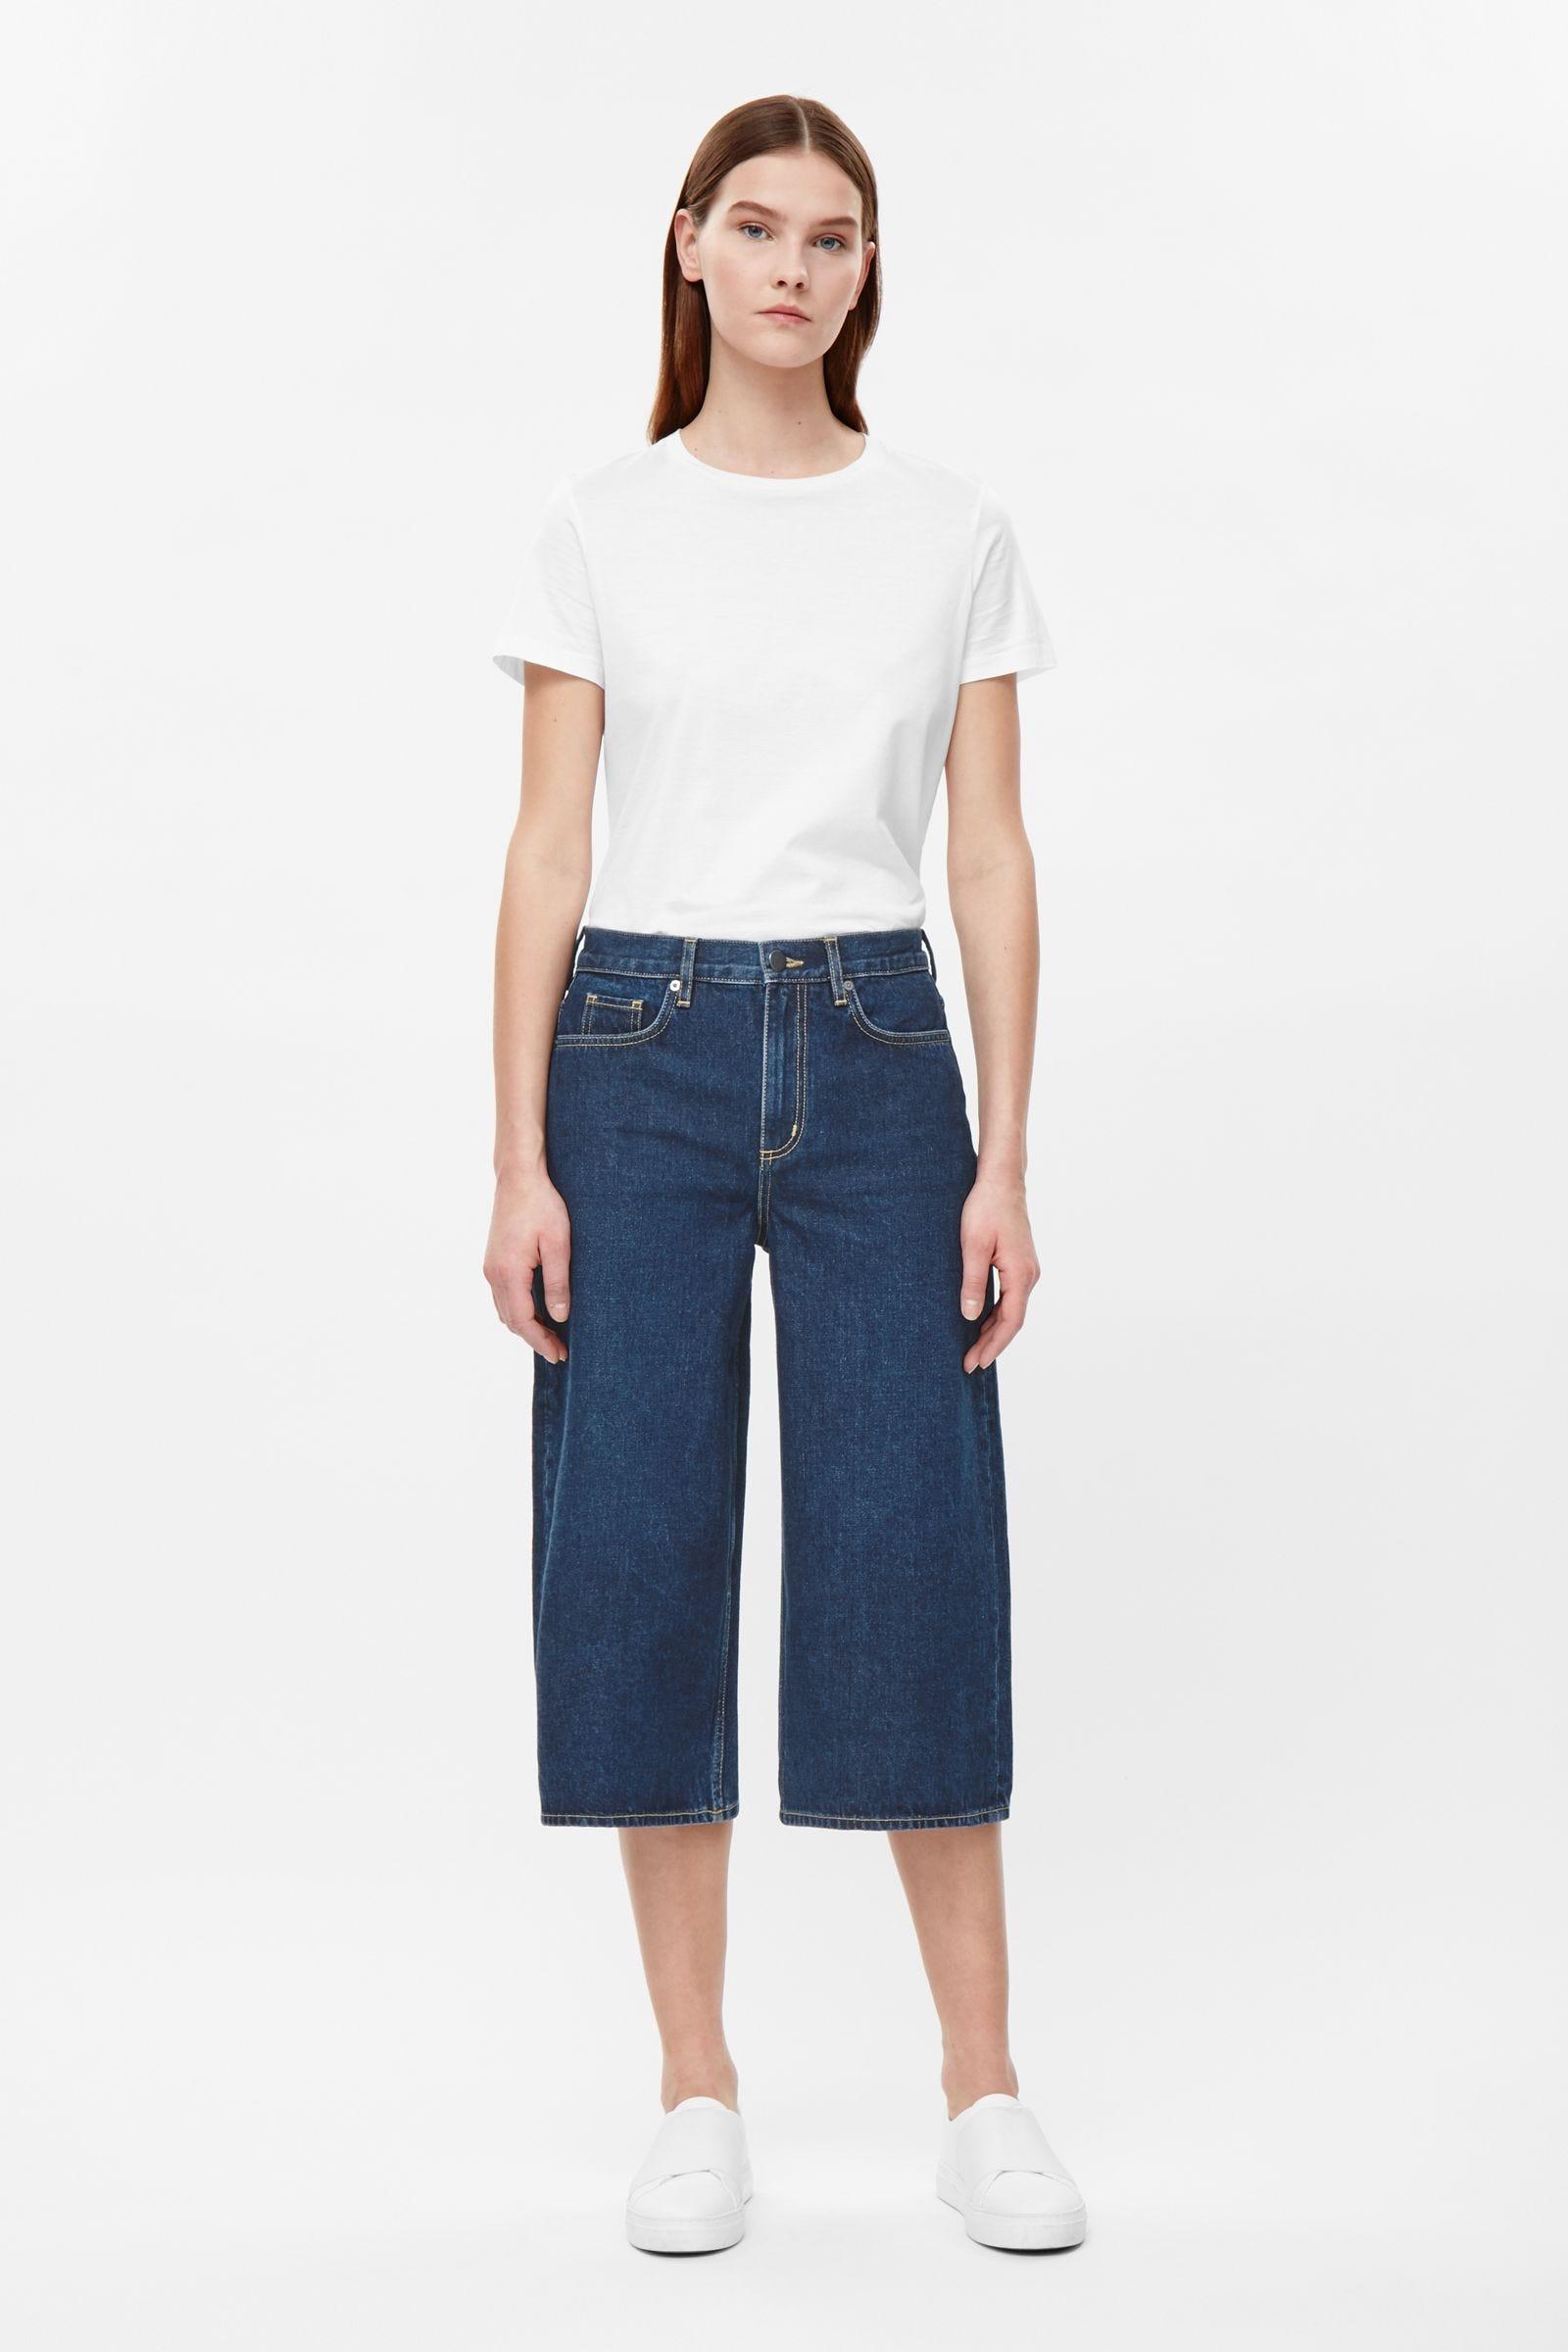 Vintage Clothing Trends Mom Jeans Style Tips Velvet